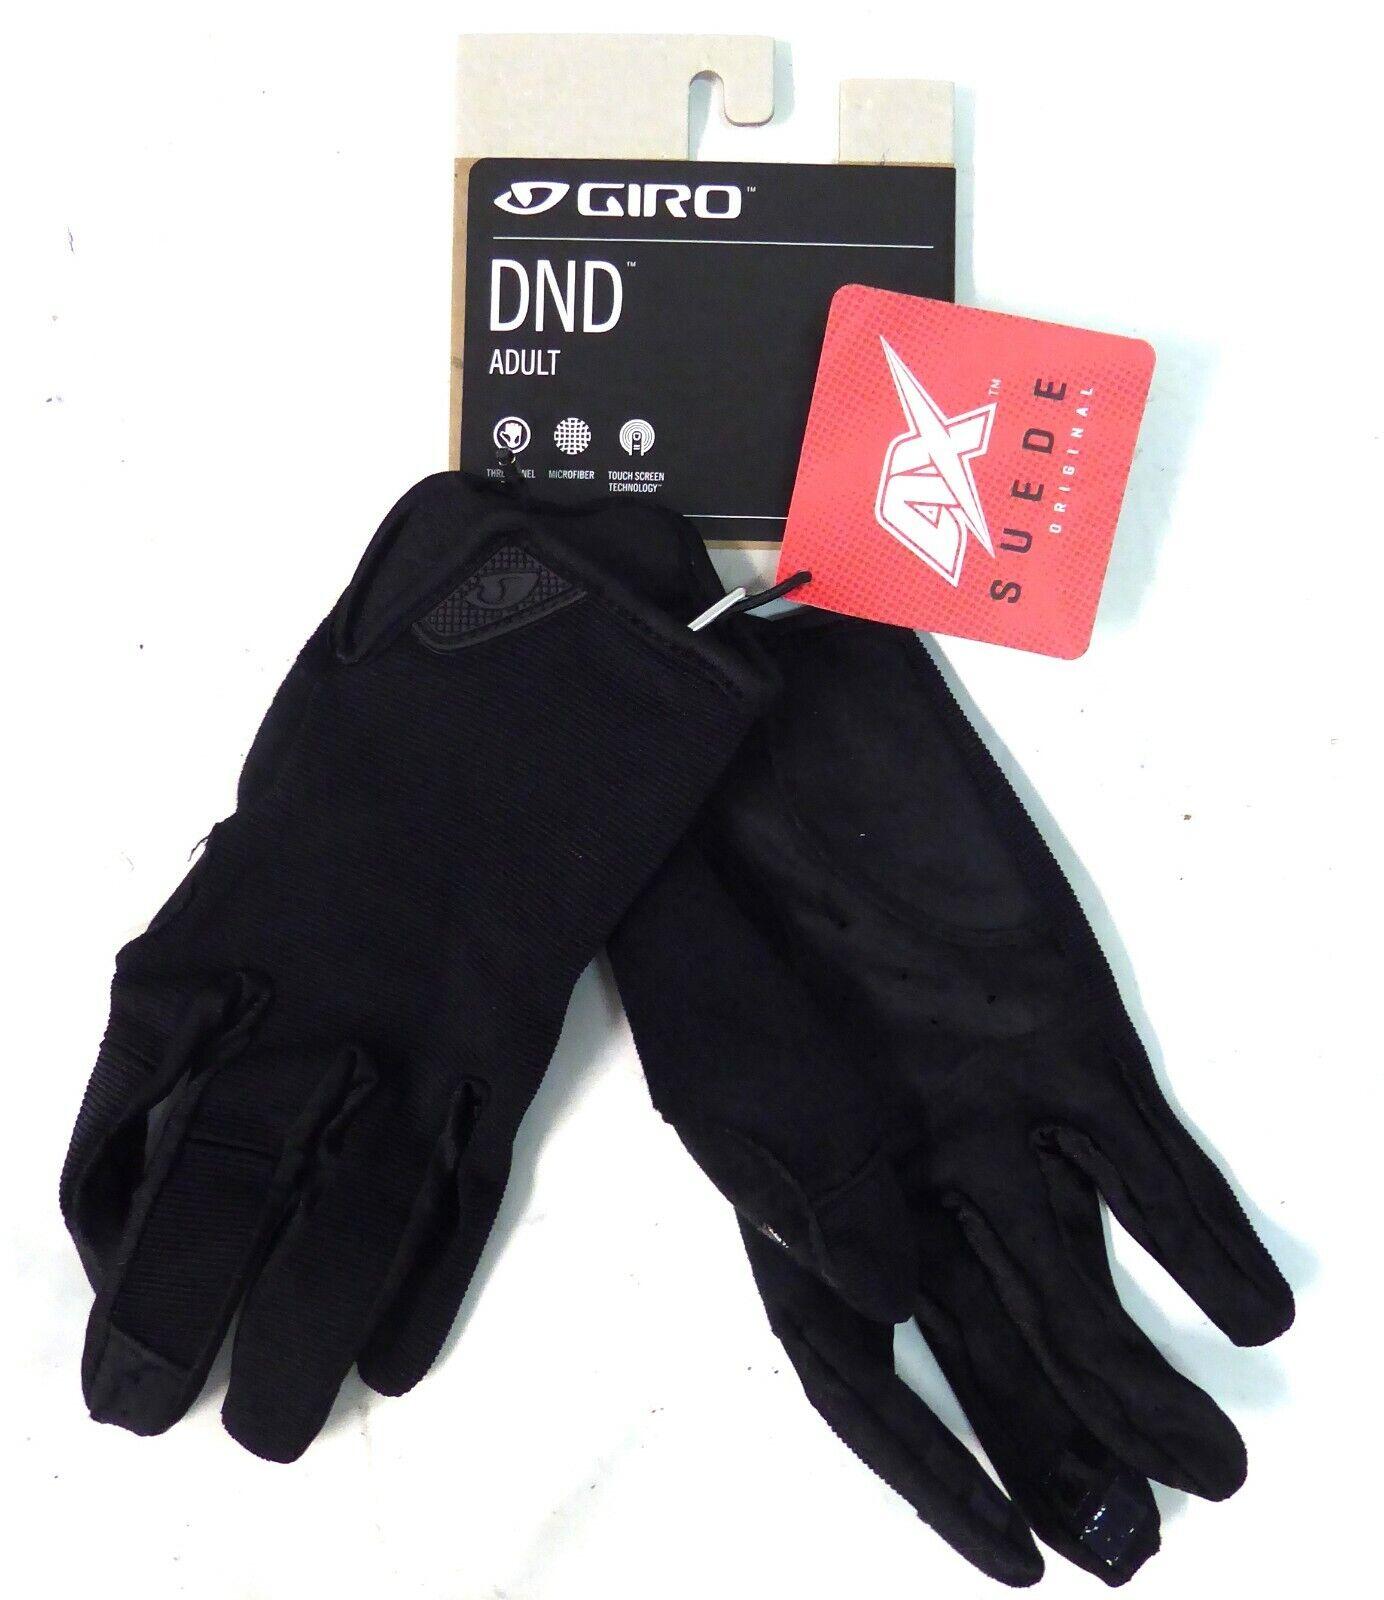 dnd gloves black